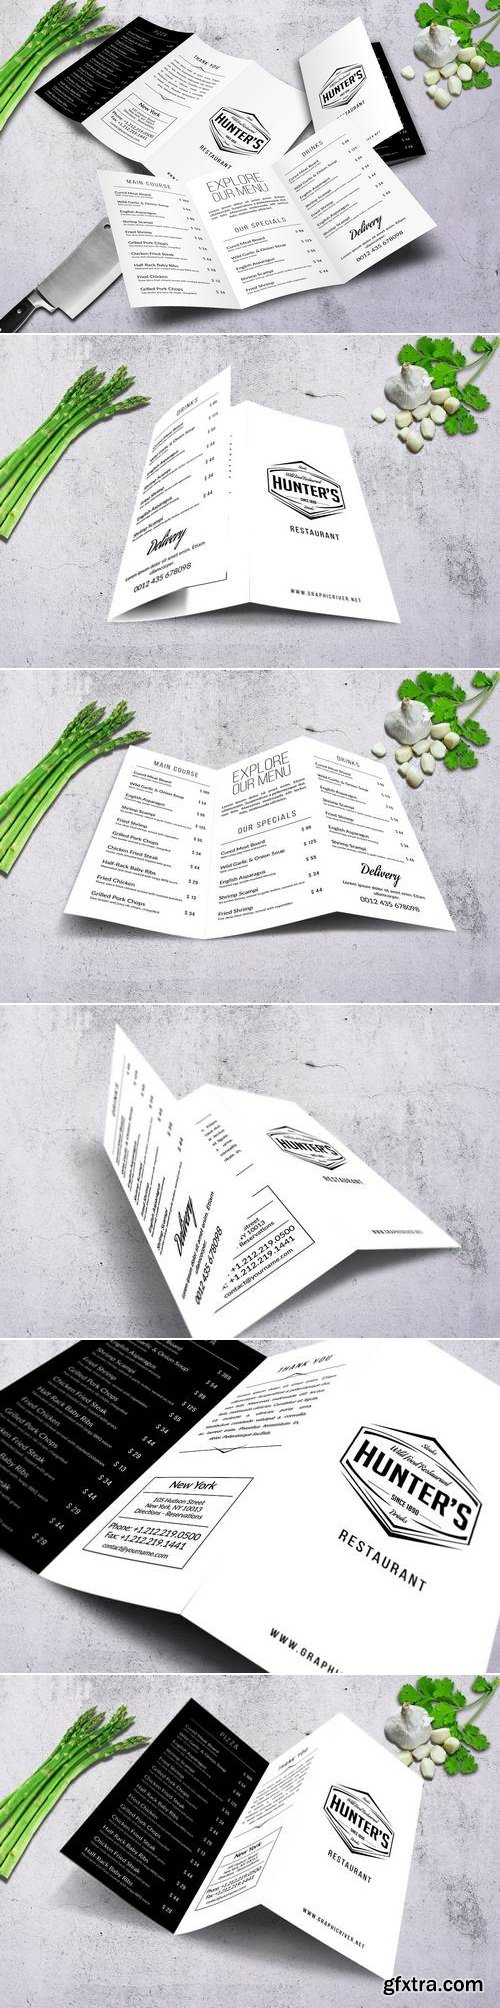 Minimal A4 Trifold Food Menu Design